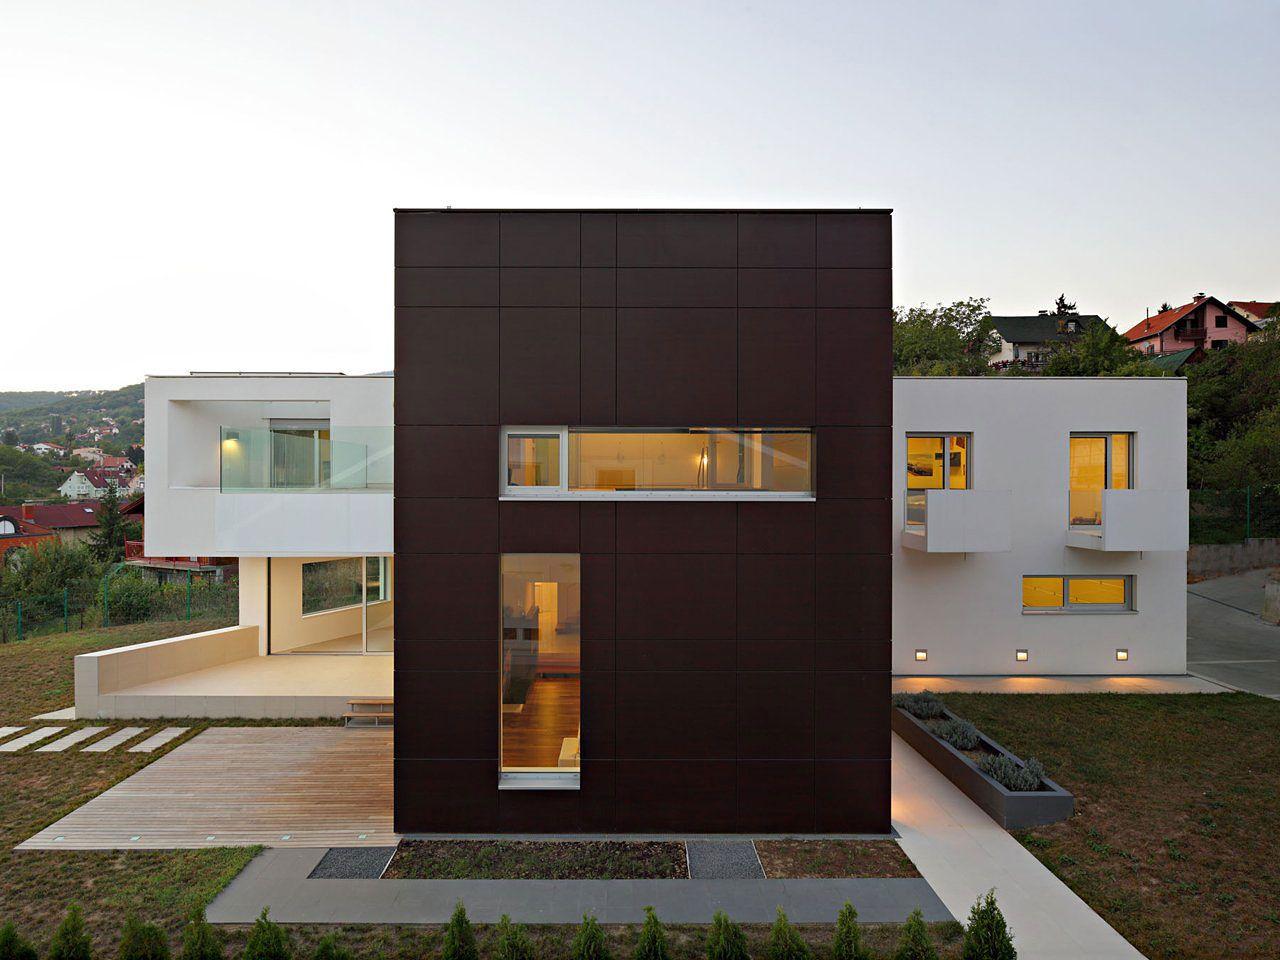 j20-house-08